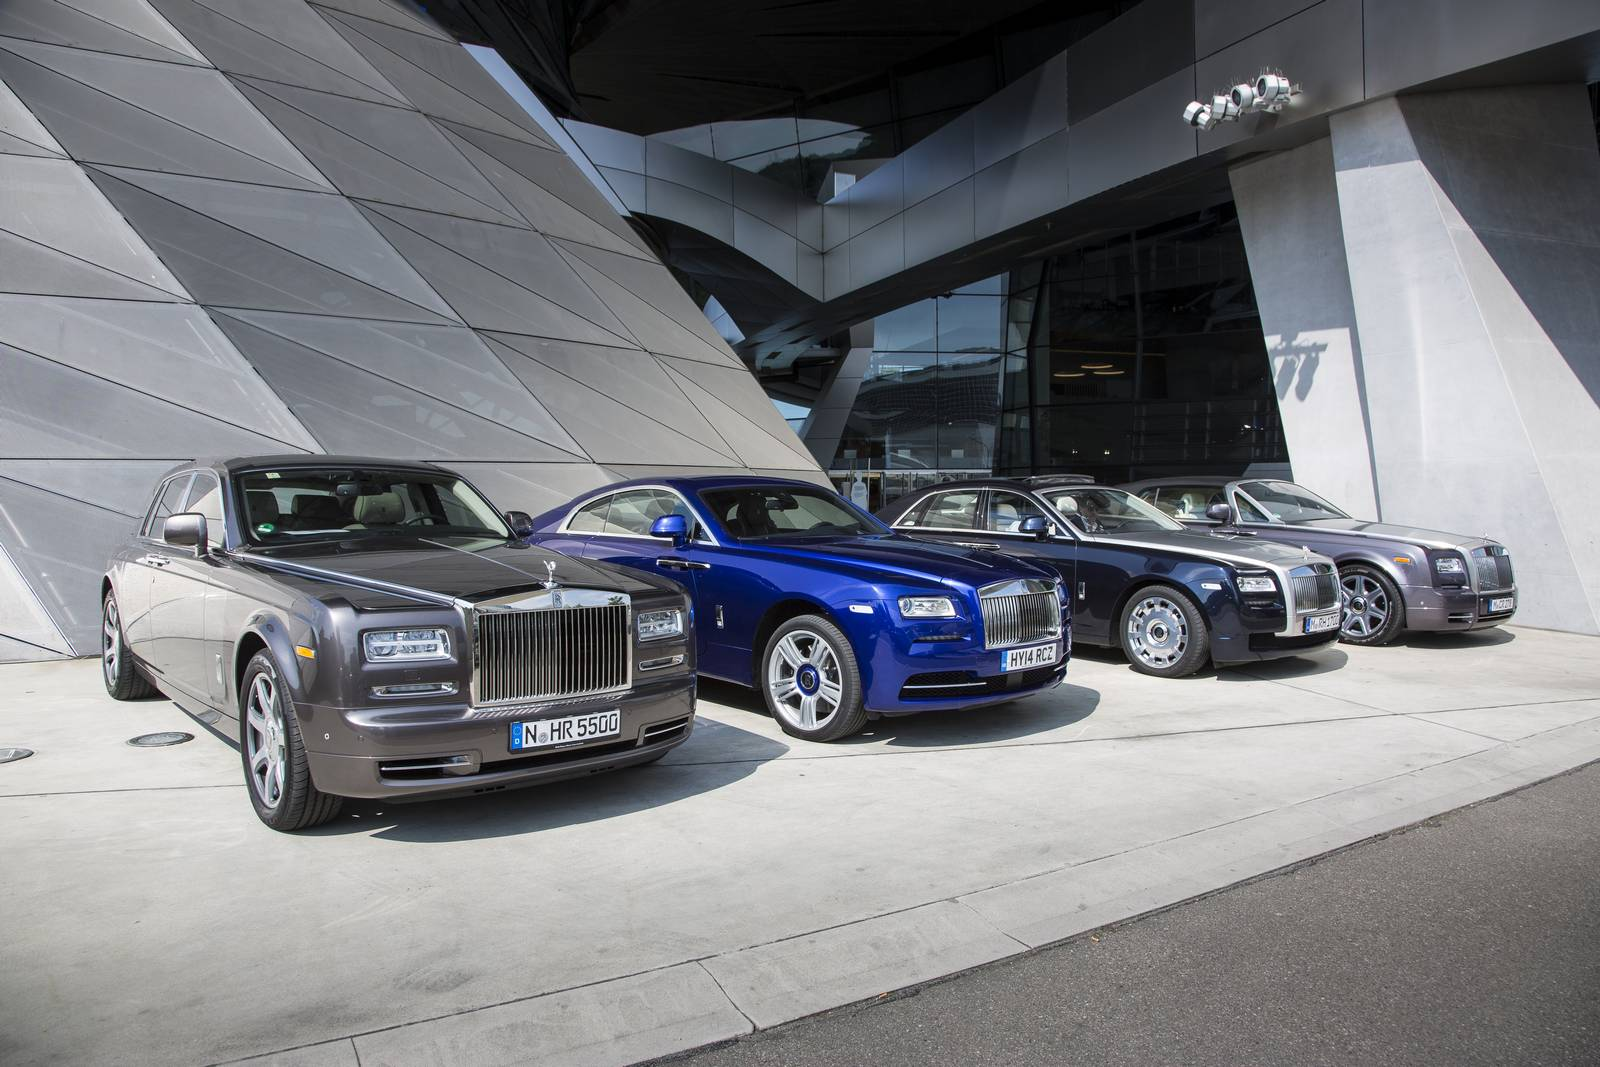 Rolls Royce Wraith For Sale >> Special Report: Rolls-Royce Wraith, Ghost and Phantom Comparison Tour - GTspirit